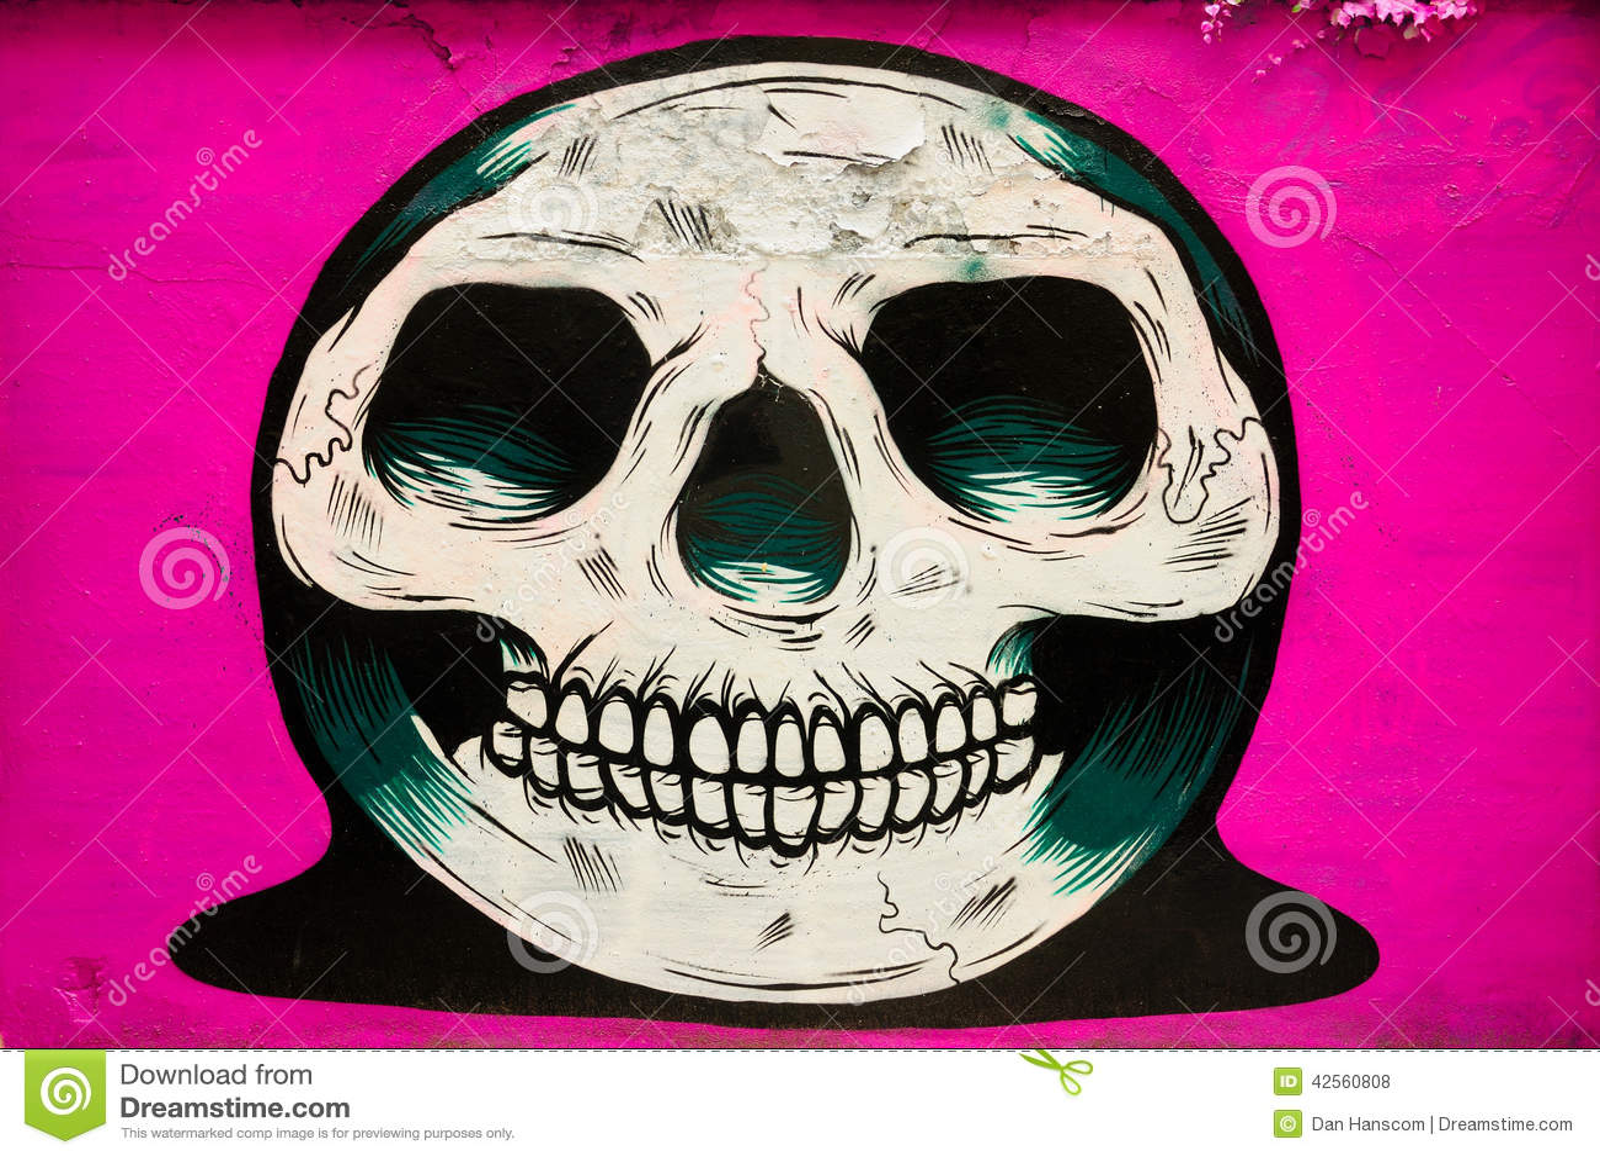 Graffiti Skull Editorial Stock Photo Image 42560808